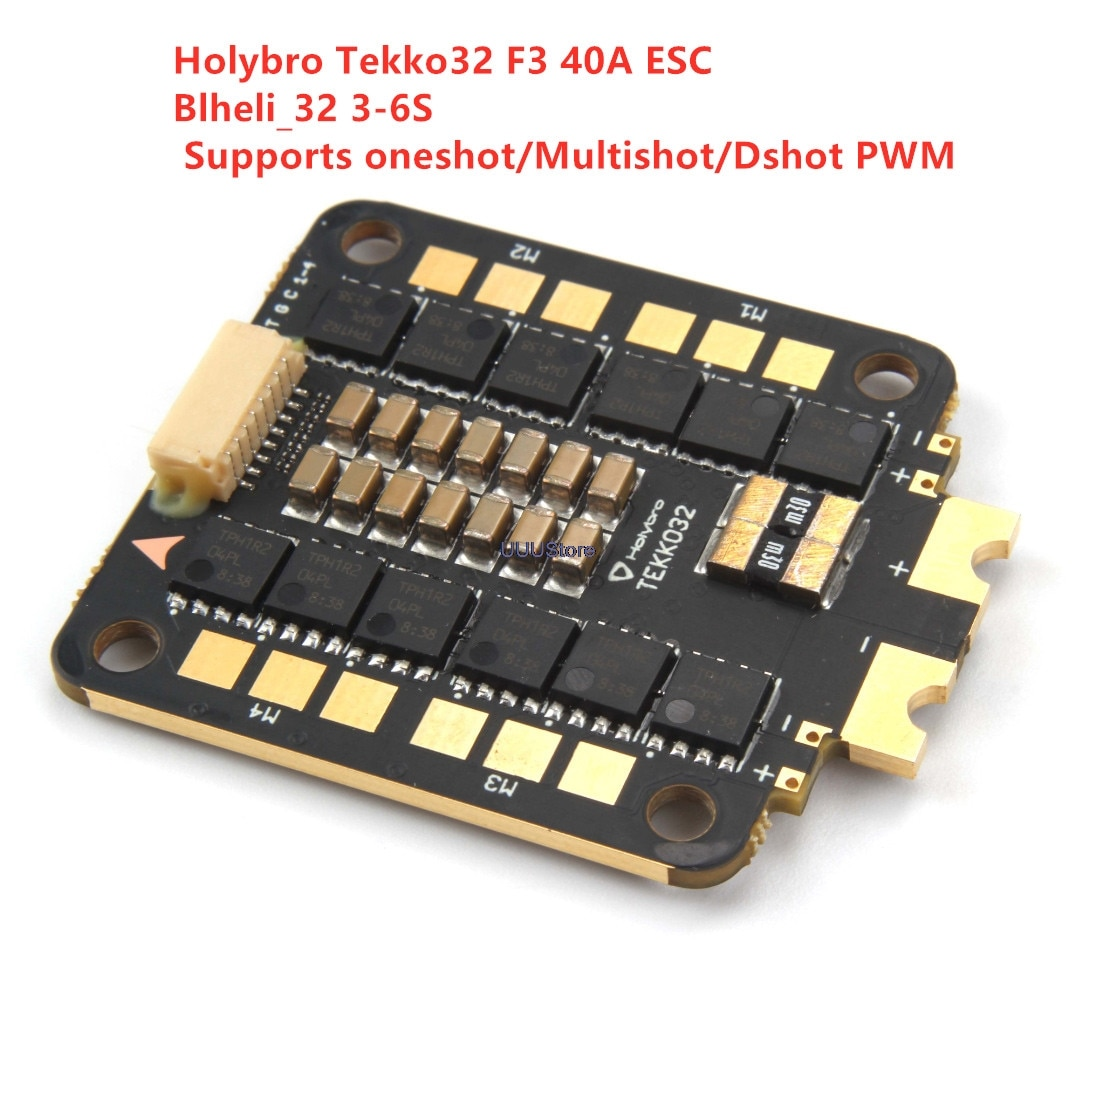 Holybro tekko32 f3 40a blheli_32 3-6 s 30.5x30.5mm 4 em 1 sem escova esc suporta oneshot/multishot/dshot pwm para rc zangão